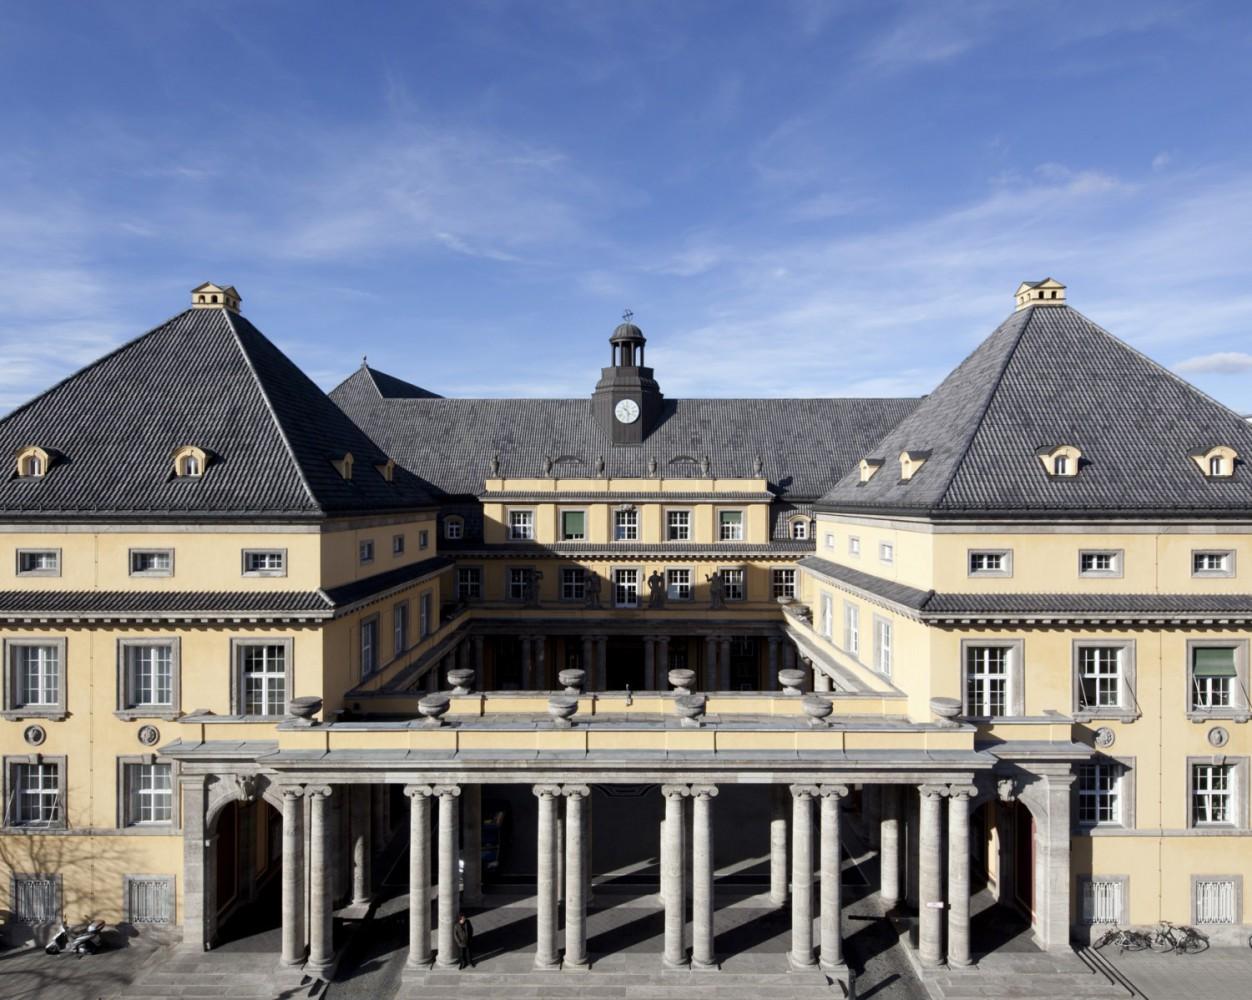 Munich Re - Sede Monaco di Baviera Imc